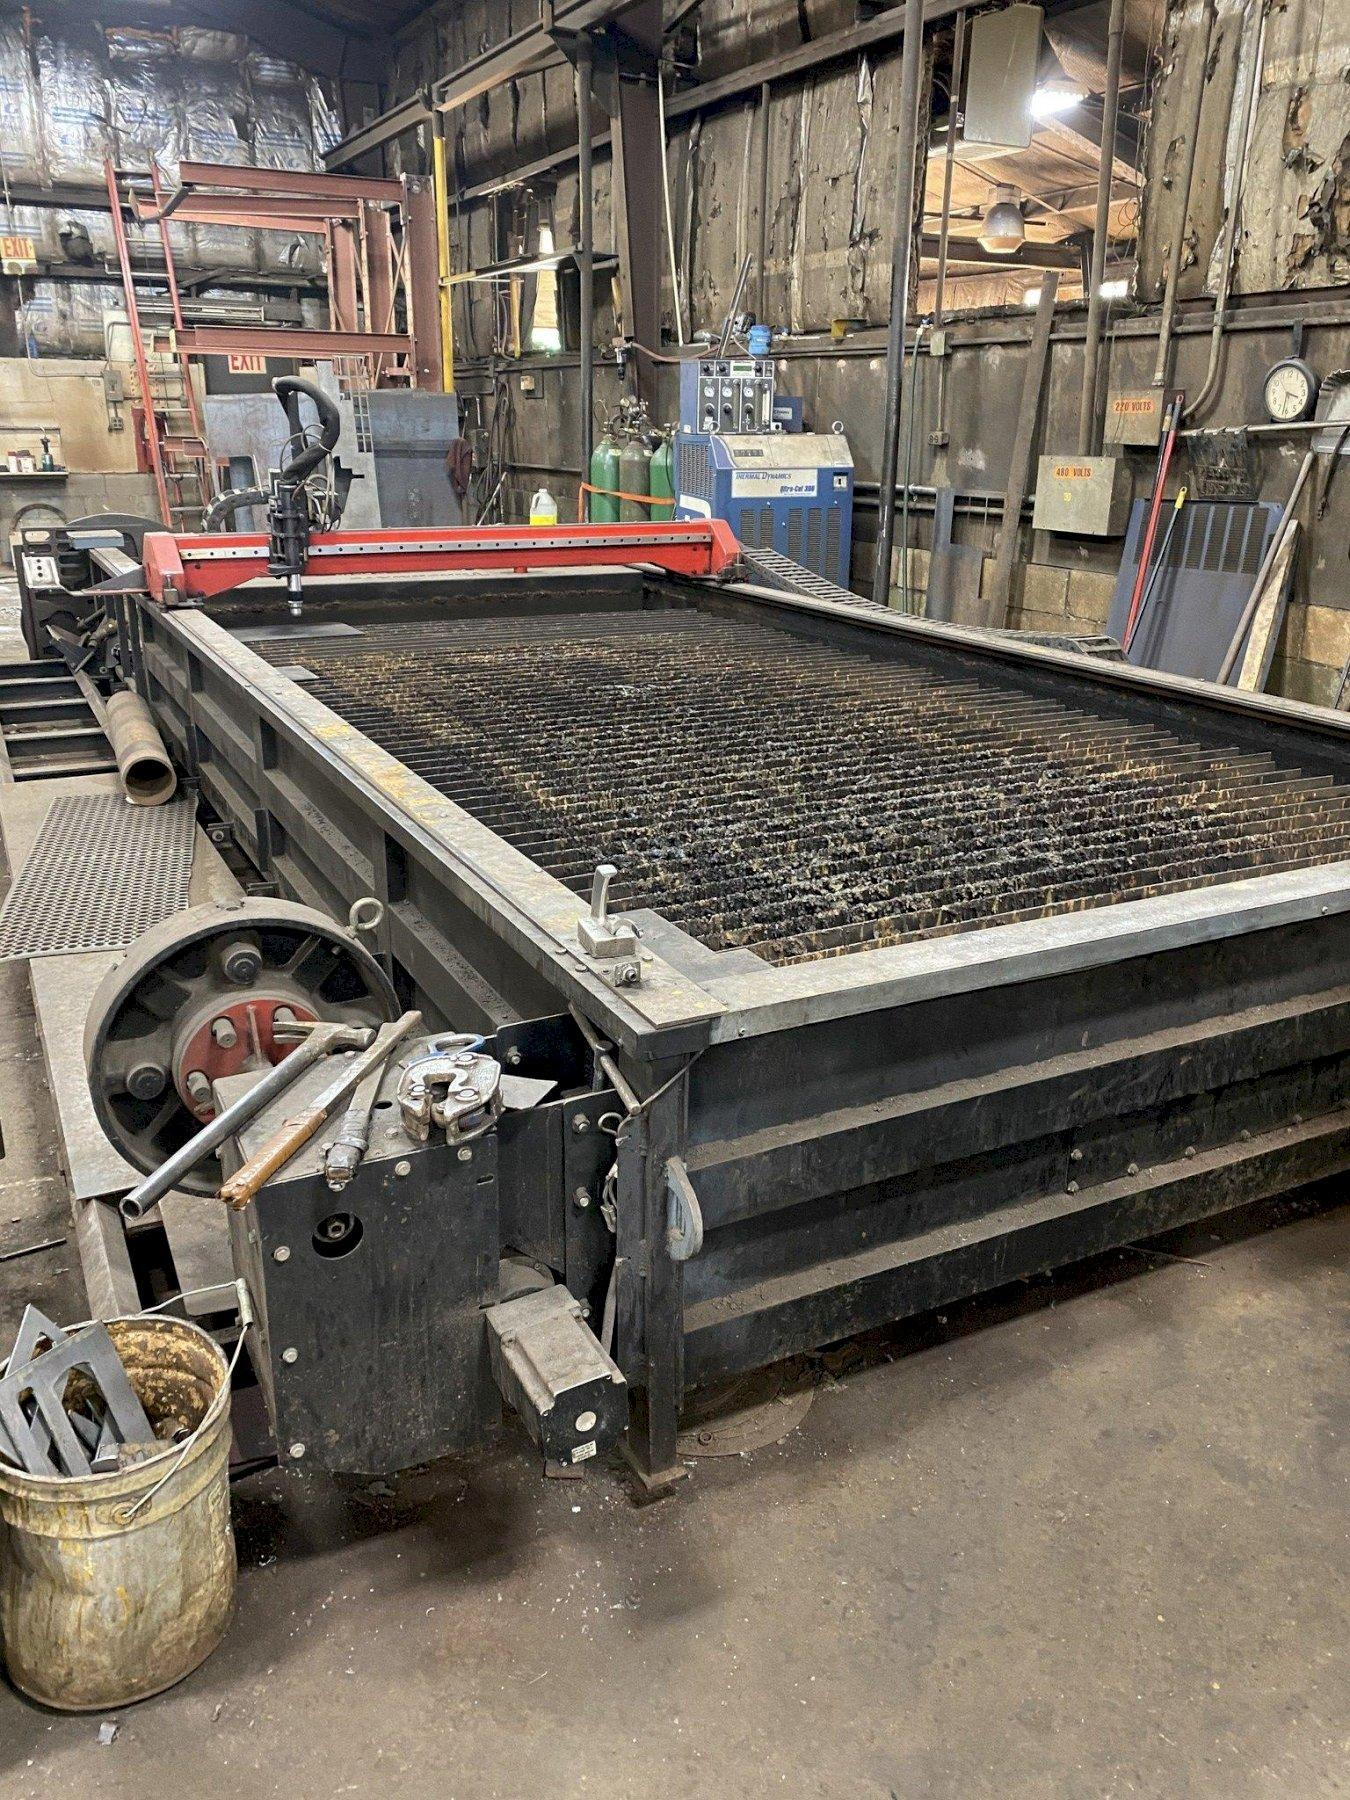 6' x 14' Torchmate Model X CNC plasma table